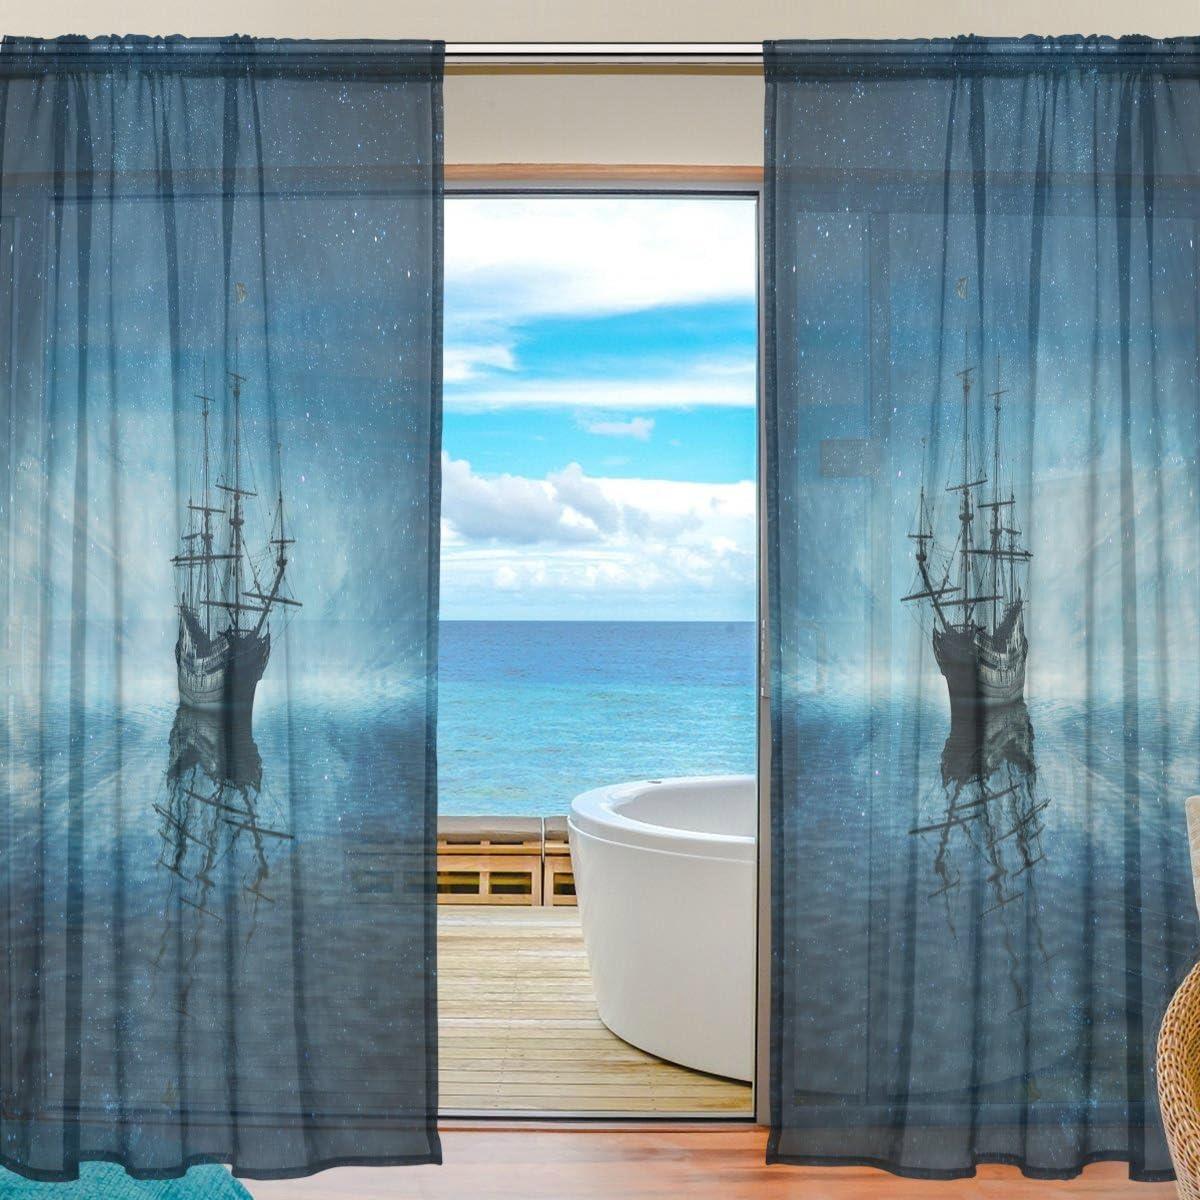 WOZO Ghost Pirate Ship Ocean Sea Window Sheer Curtain Panels 55 x 84